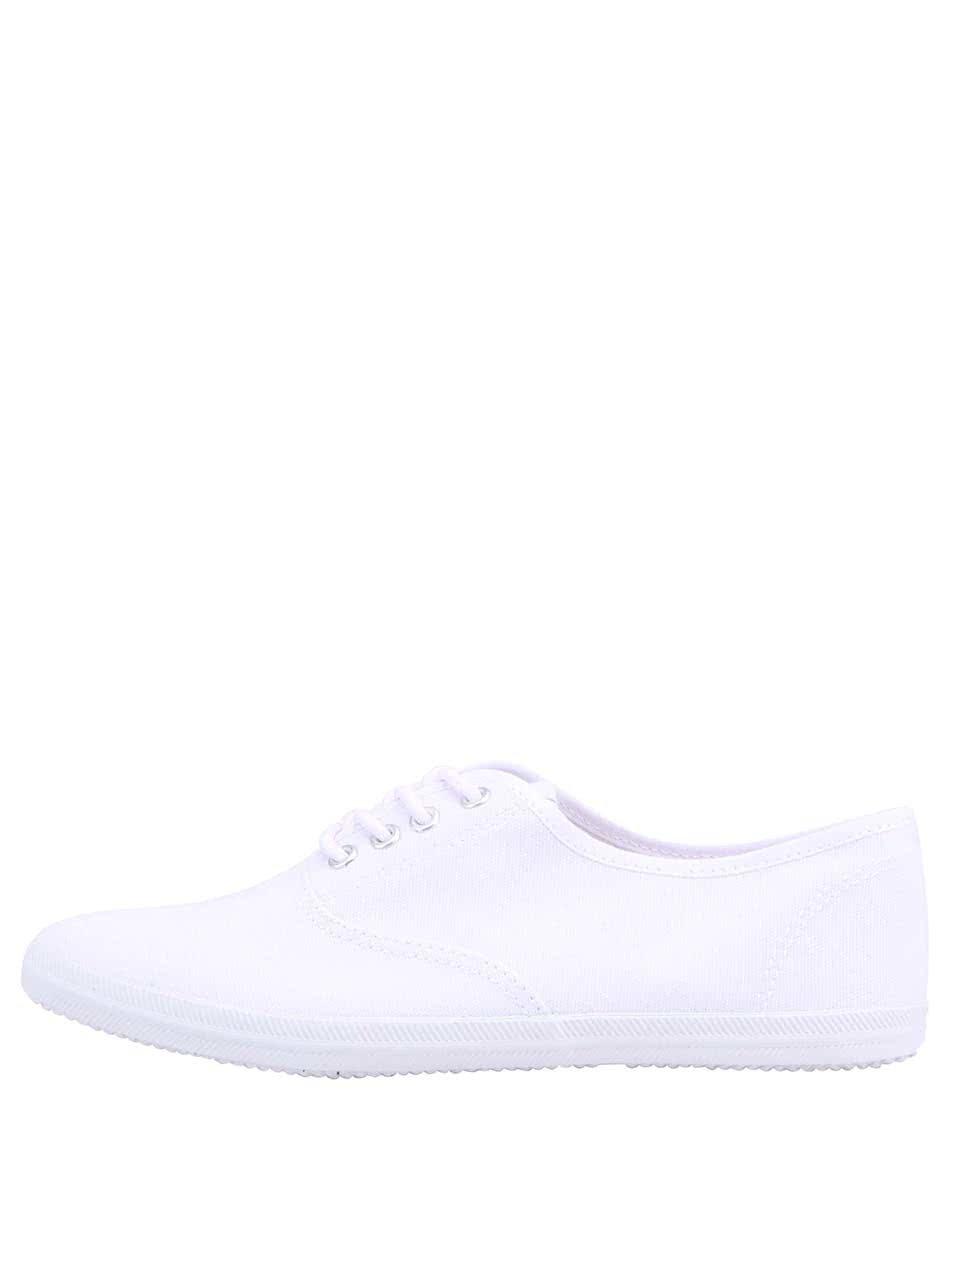 Bílé plátěné tenisky Tamaris